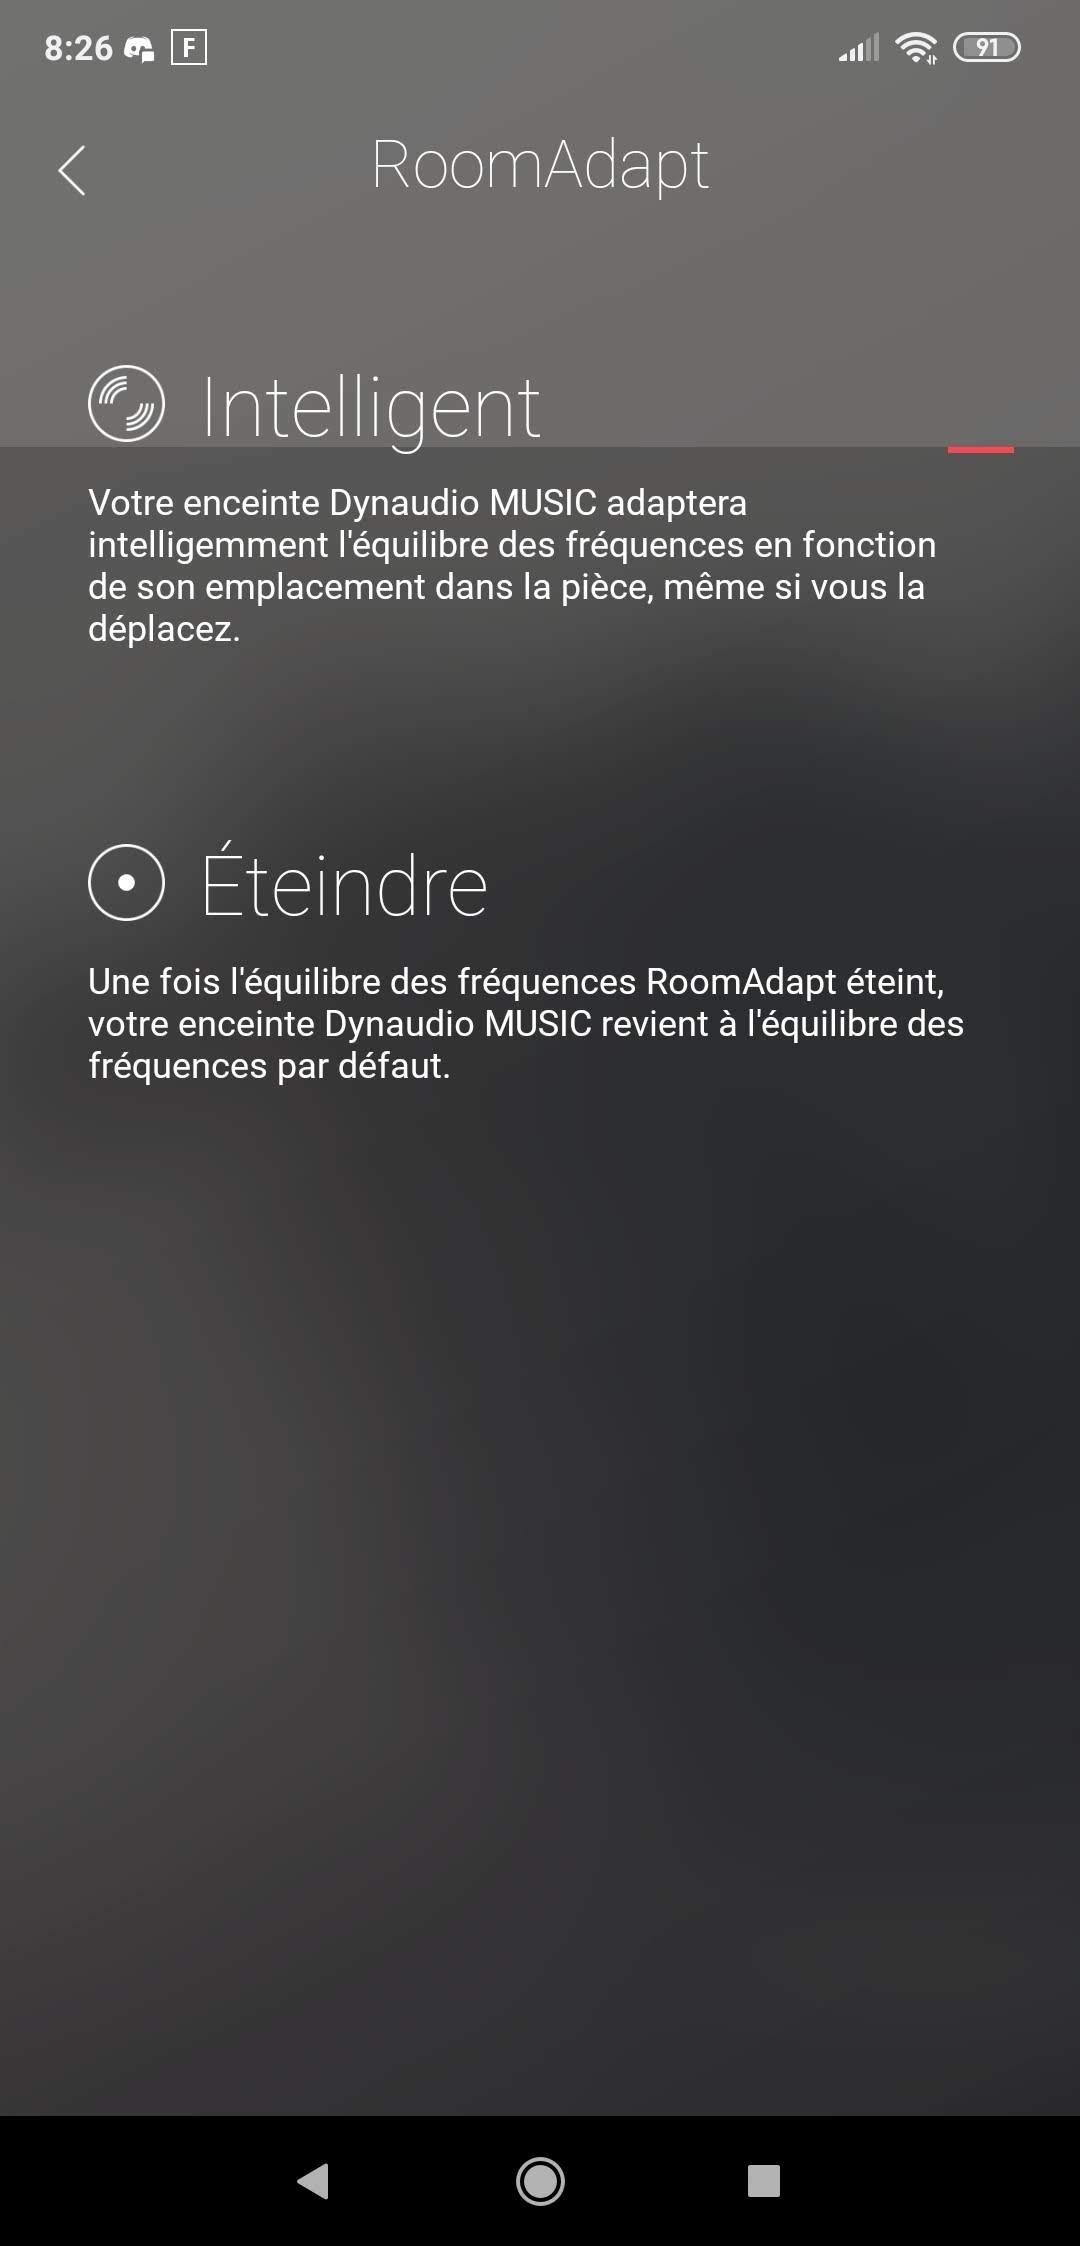 Dynaudio Music 1 - RoomAdapt